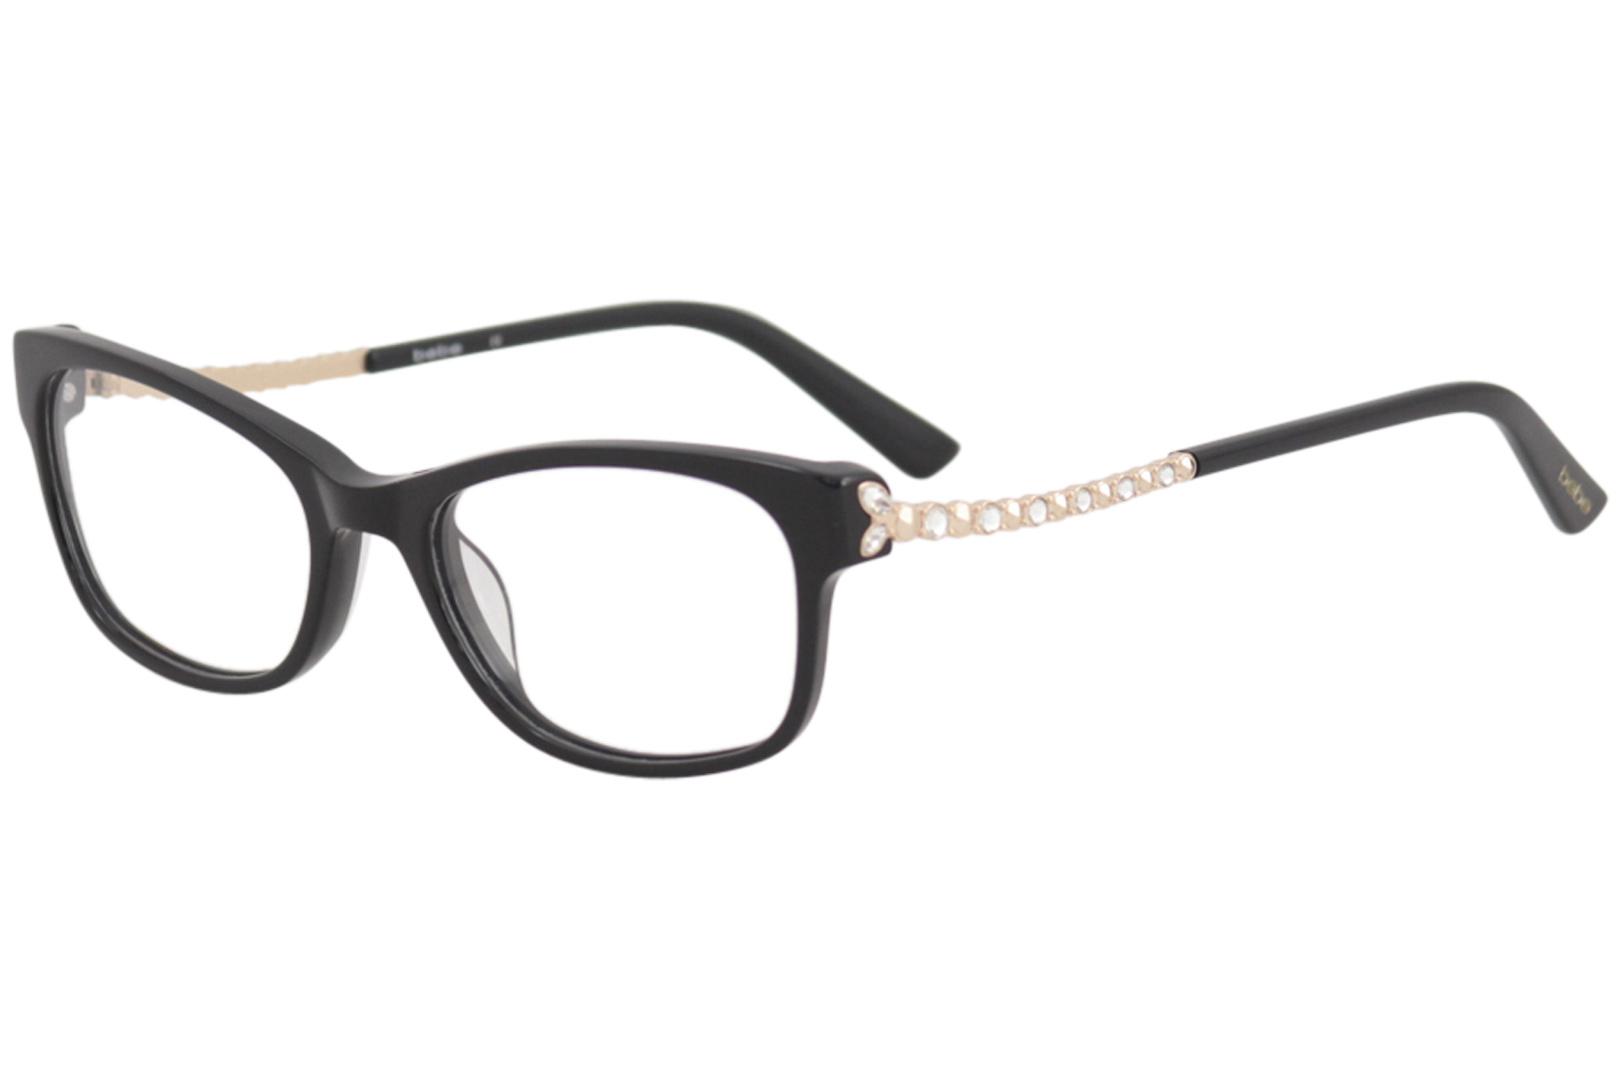 1a29e76875 Bebe Talk Of The Town Eyeglasses BB5130 BB 5130 001 Jet Optical ...